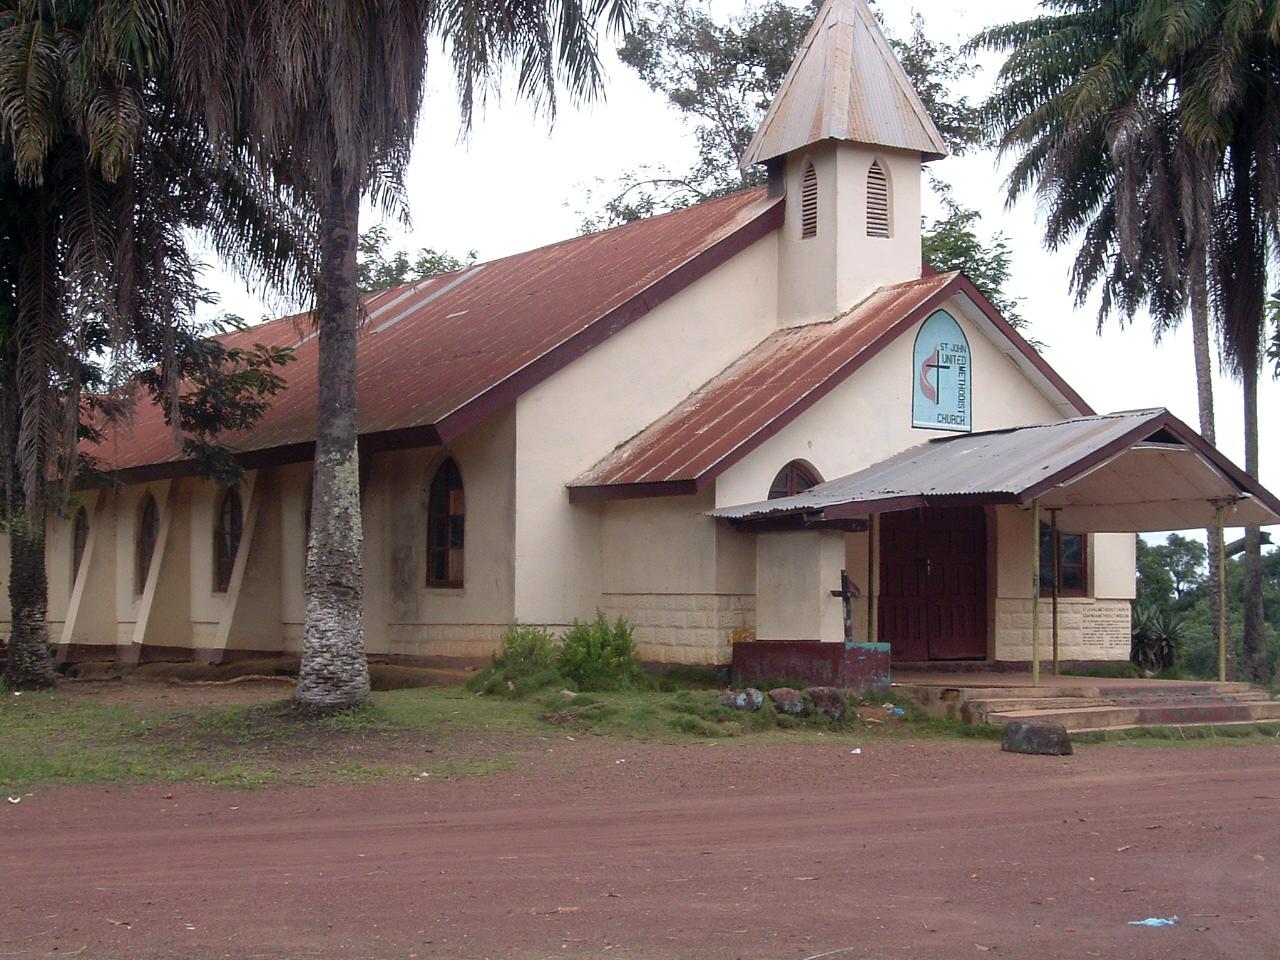 The chapel at Gbarnga School of Theology in Monrovia, Libera.